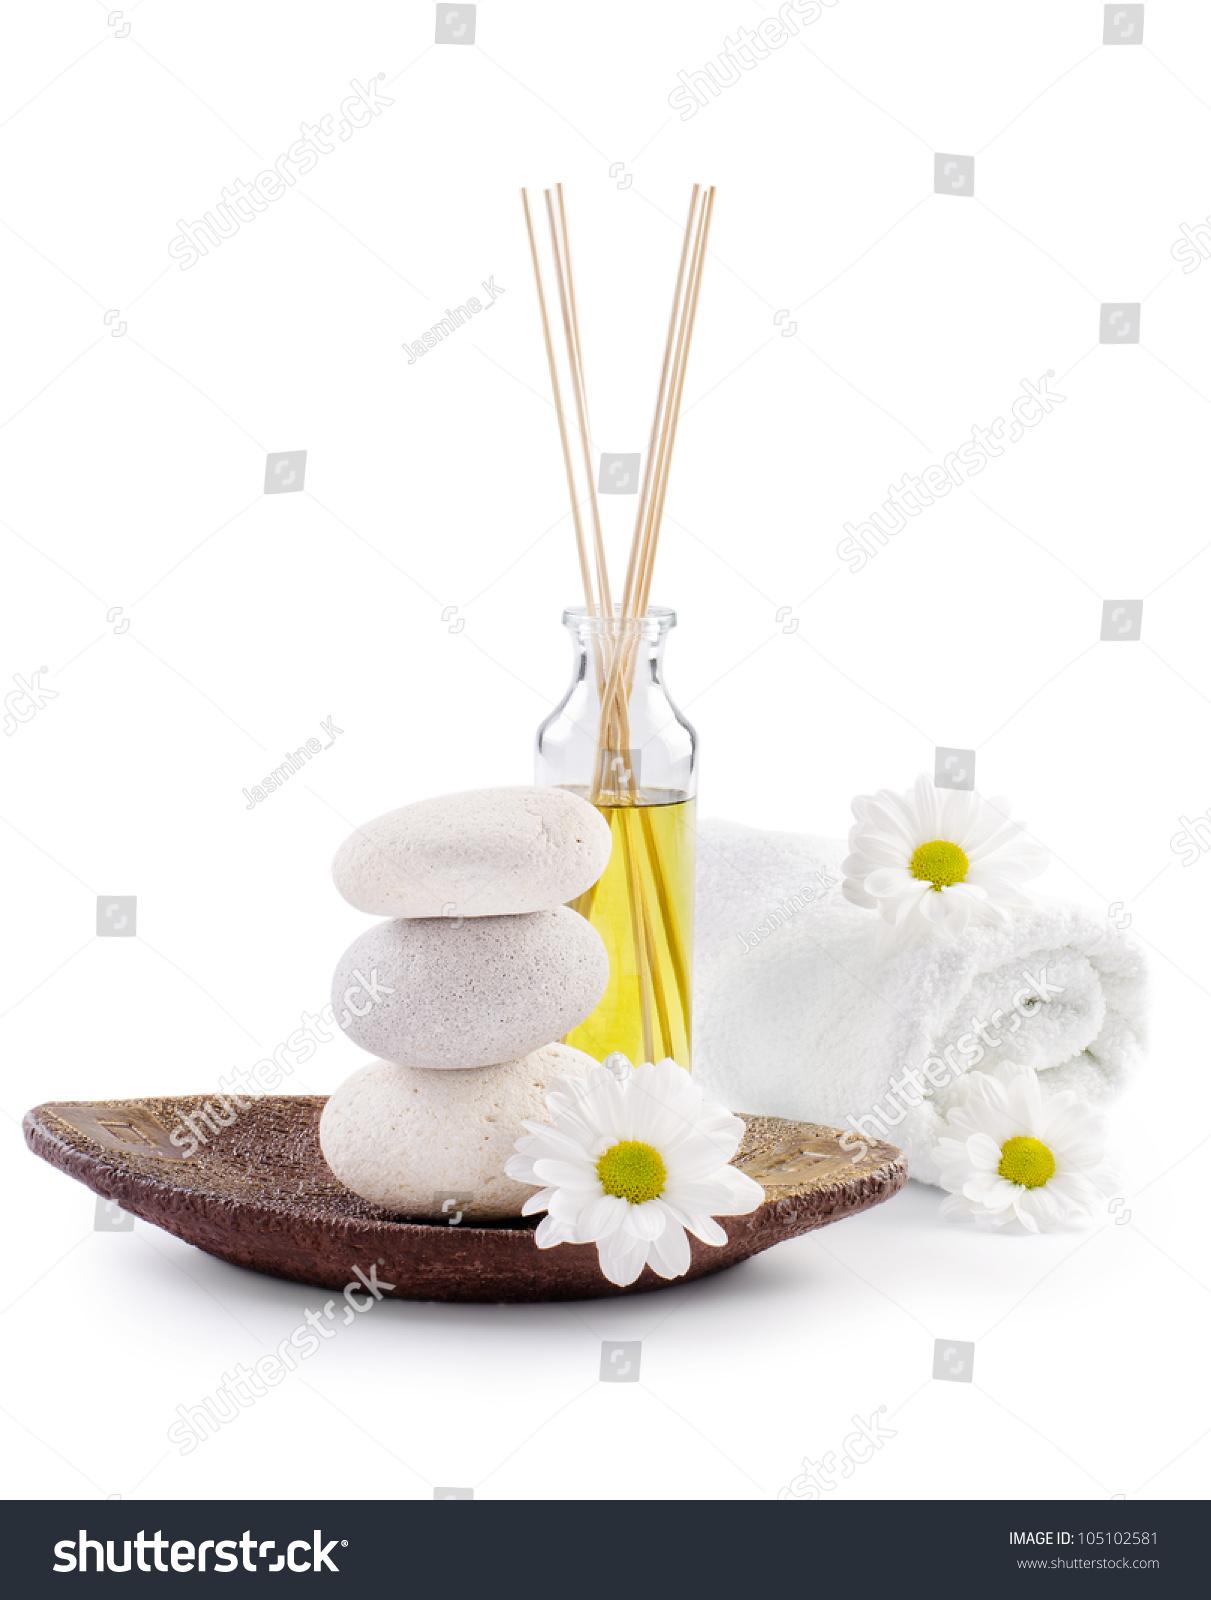 spa decoration white chrysanthemum flowers spa lagerfoto 105102581